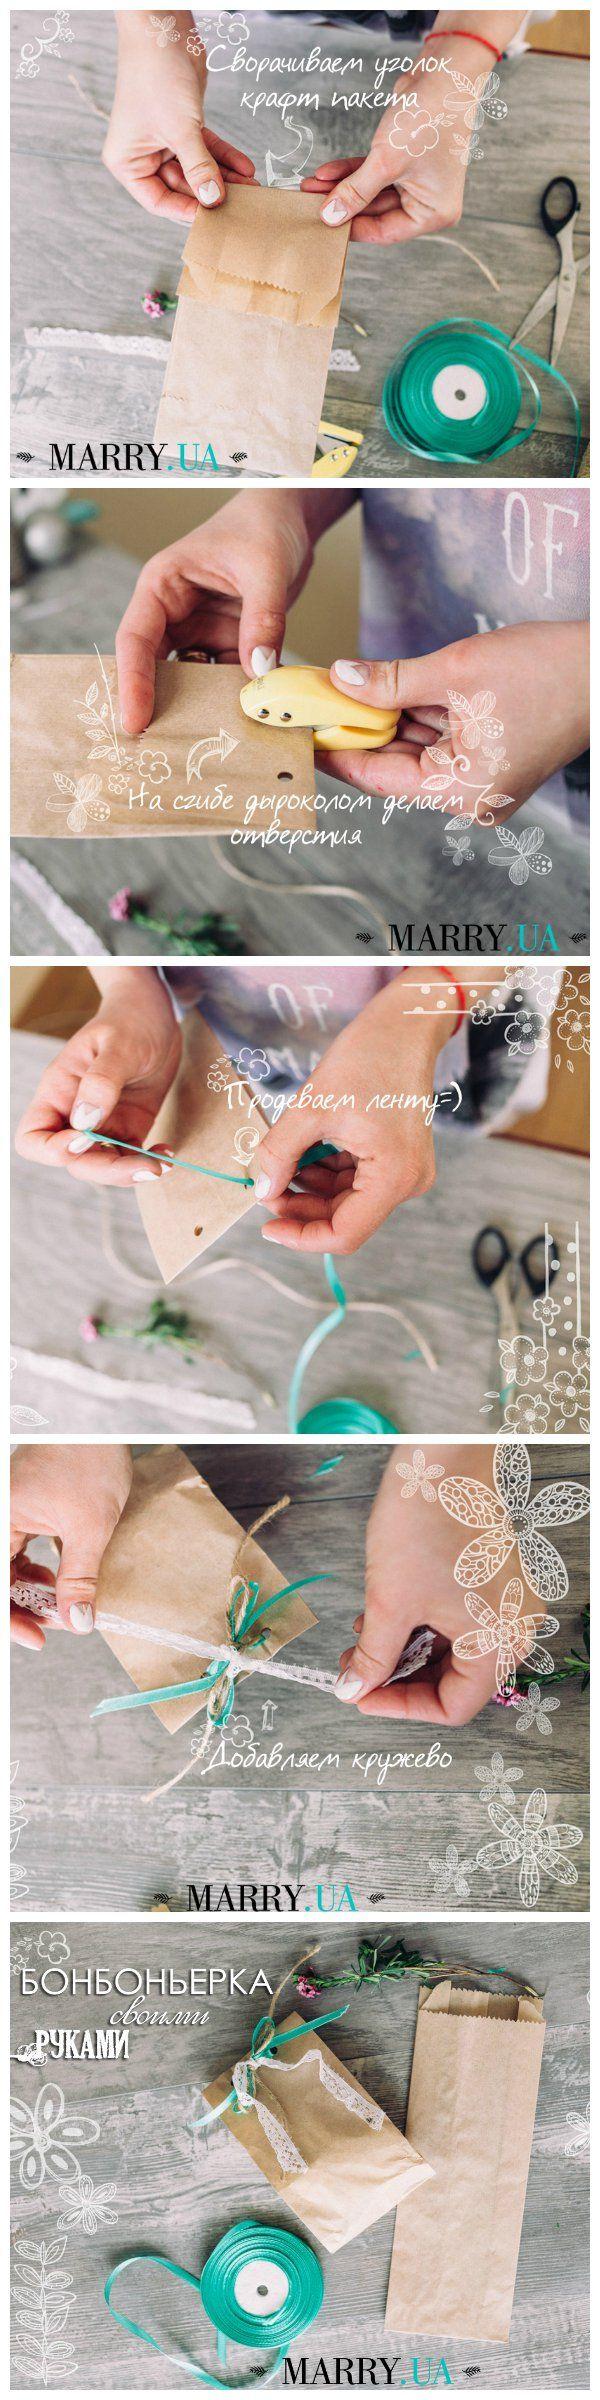 wedding diy, wedding handmade. How to make bonbonier rustic